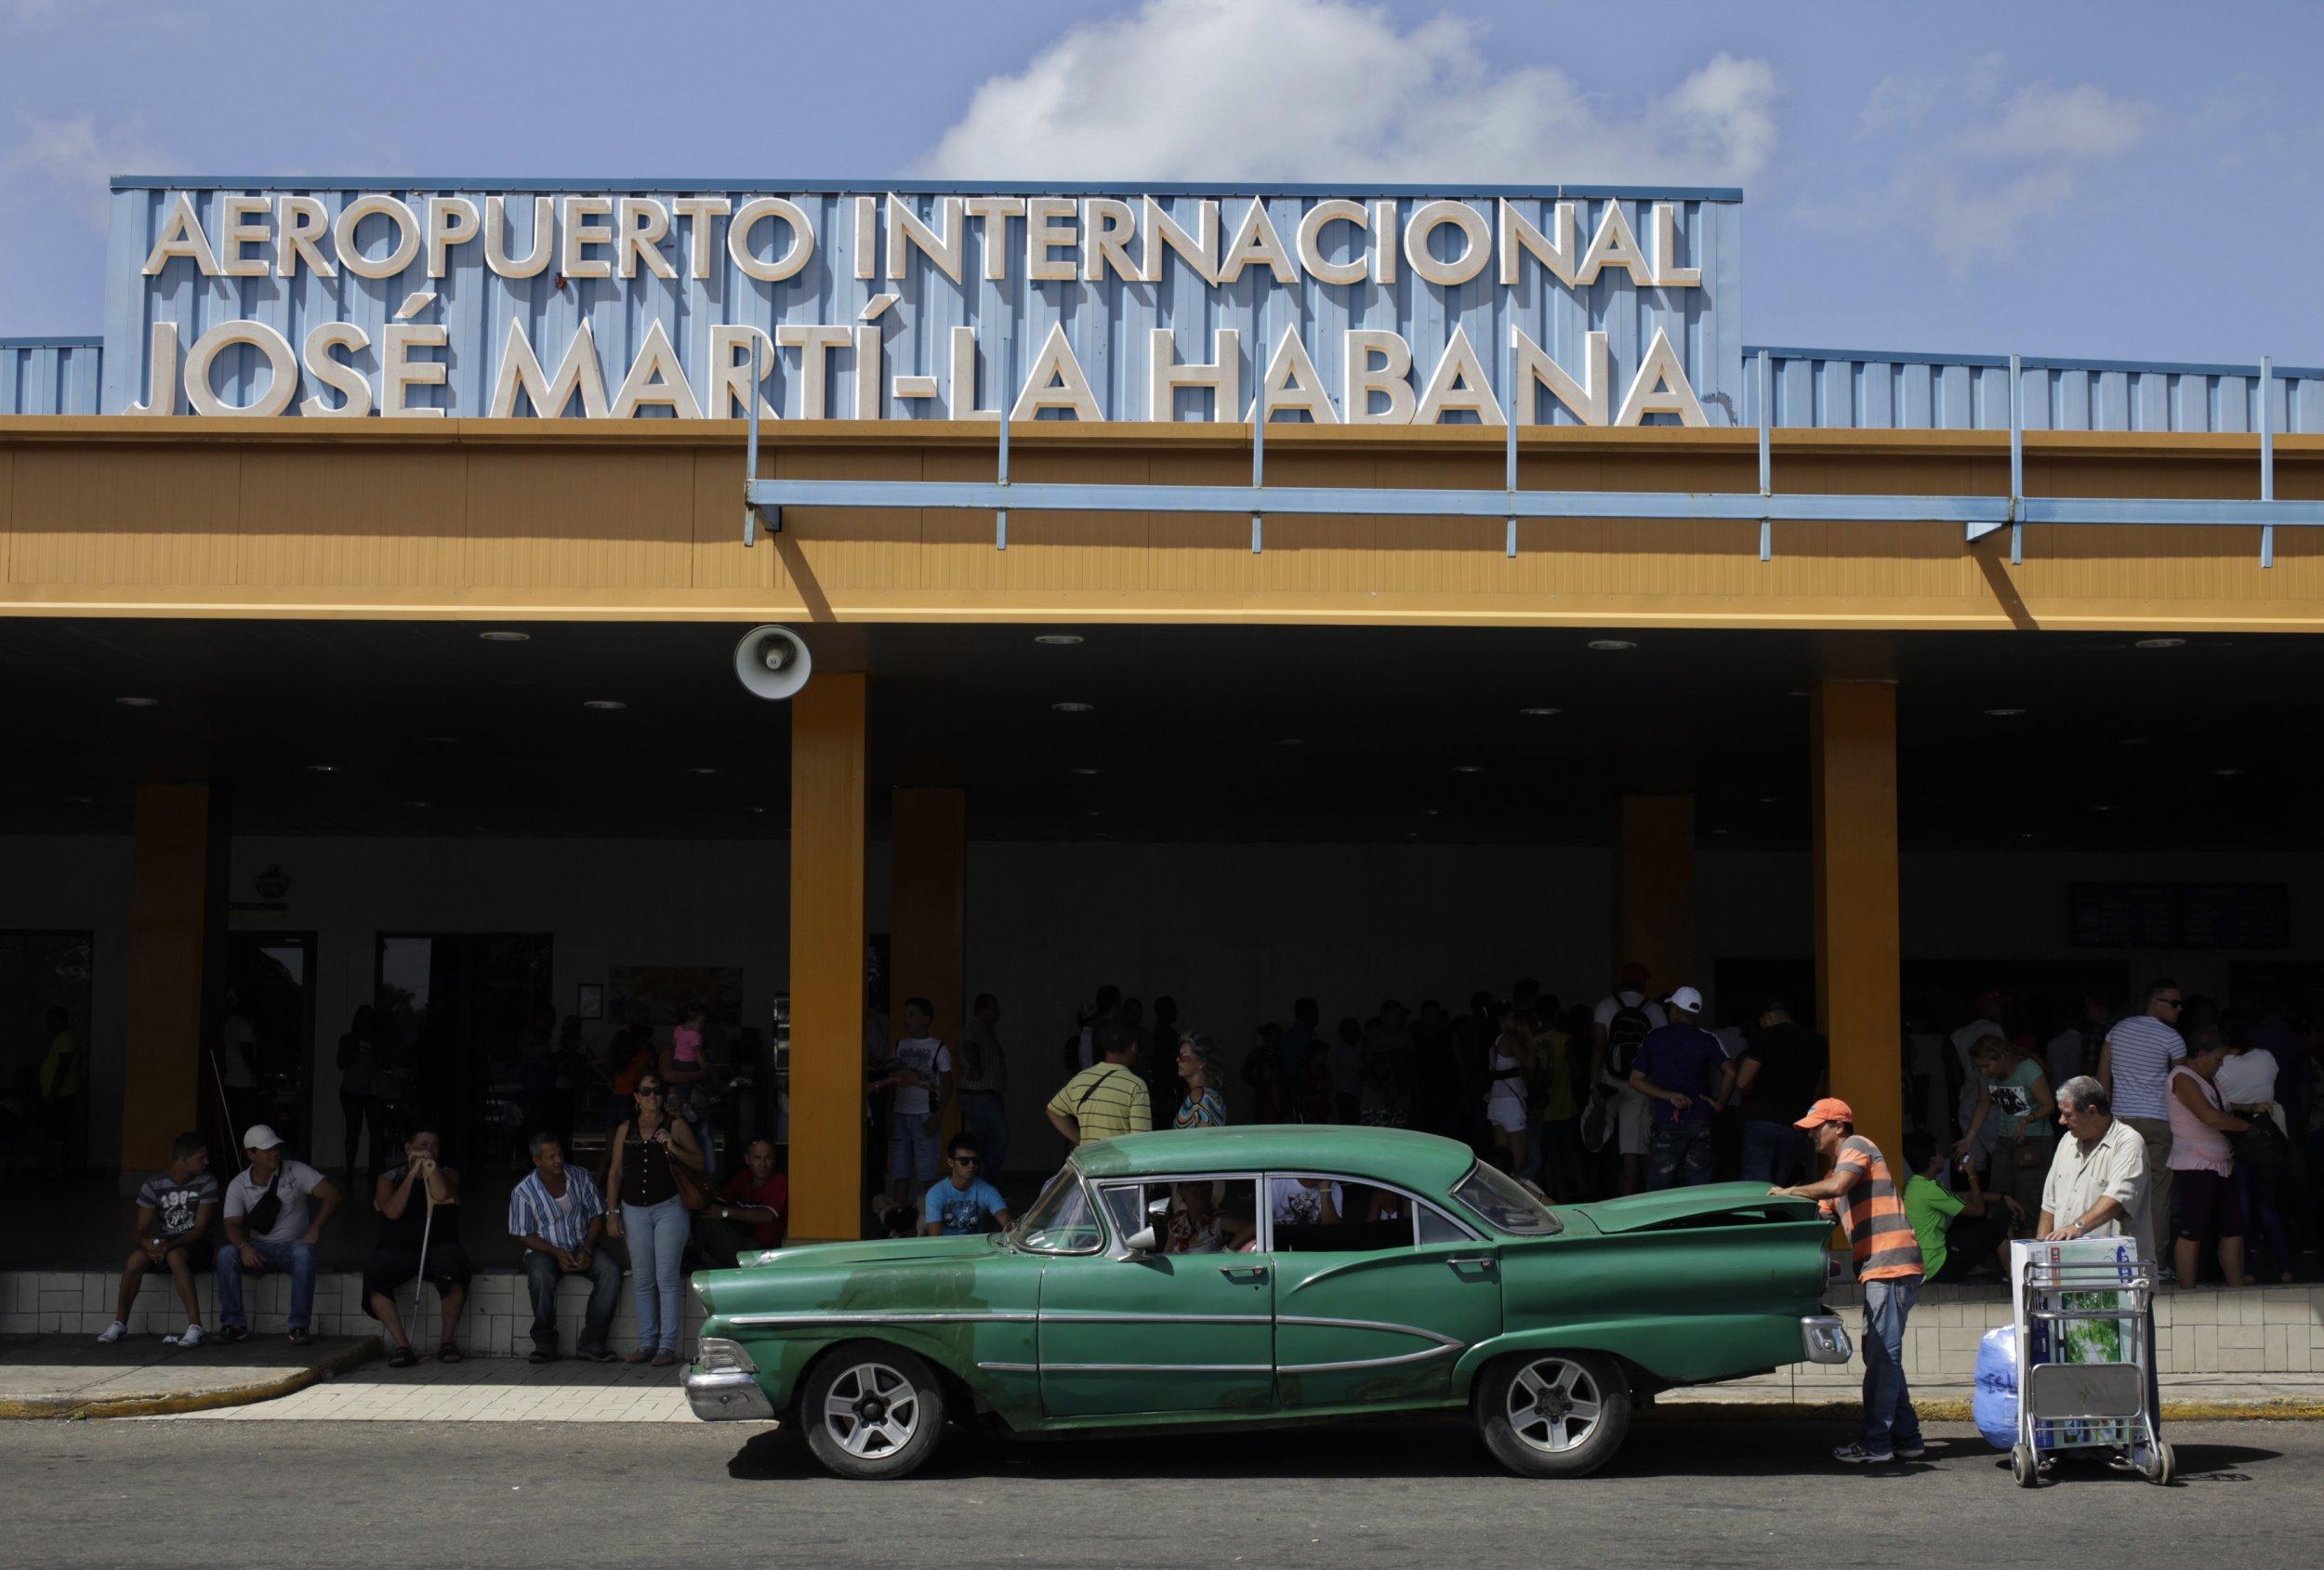 Havana International Airport Hotel